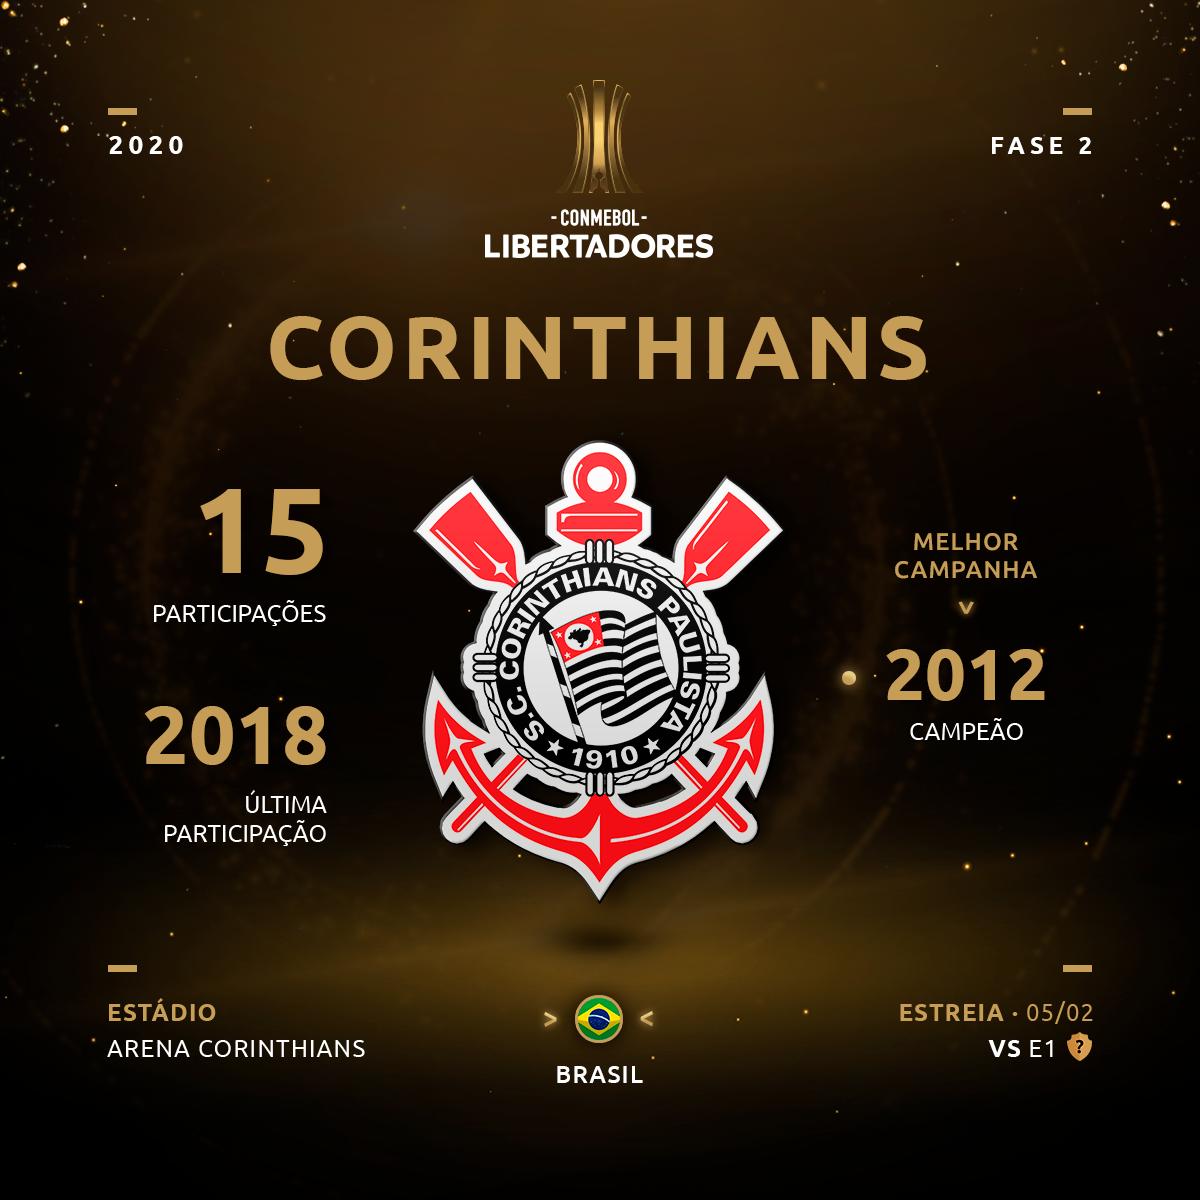 Corinthians Libertadores 2020